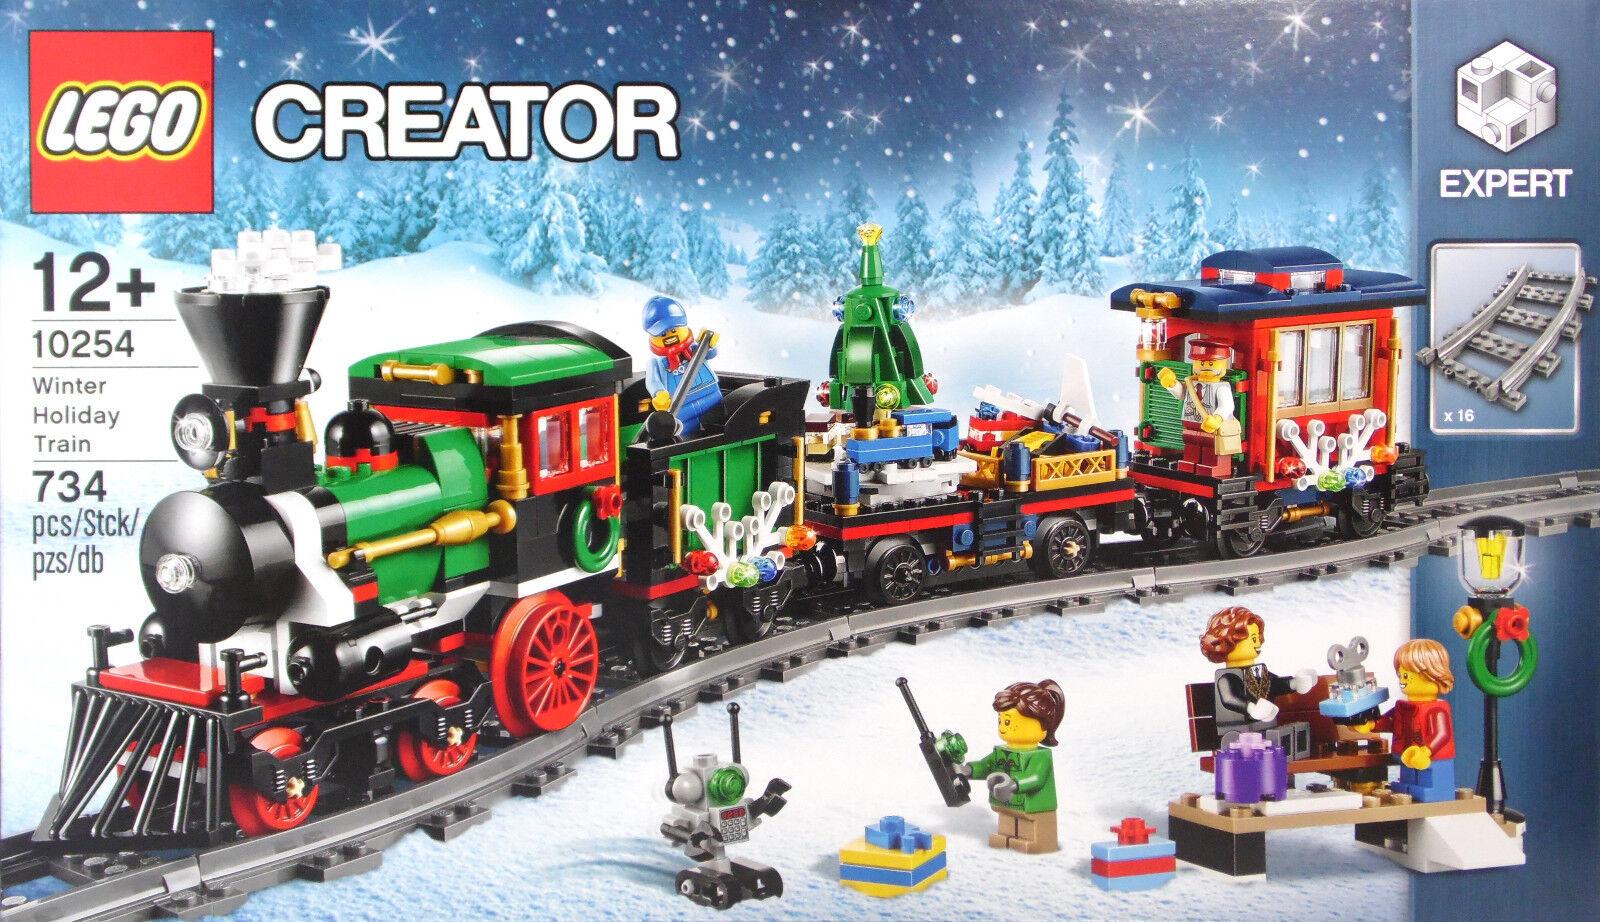 Lego Creator Expert 10254 Festif Weihnachtszug Winther HOLIDAY TRAIN Nouveau neuf dans sa boîte